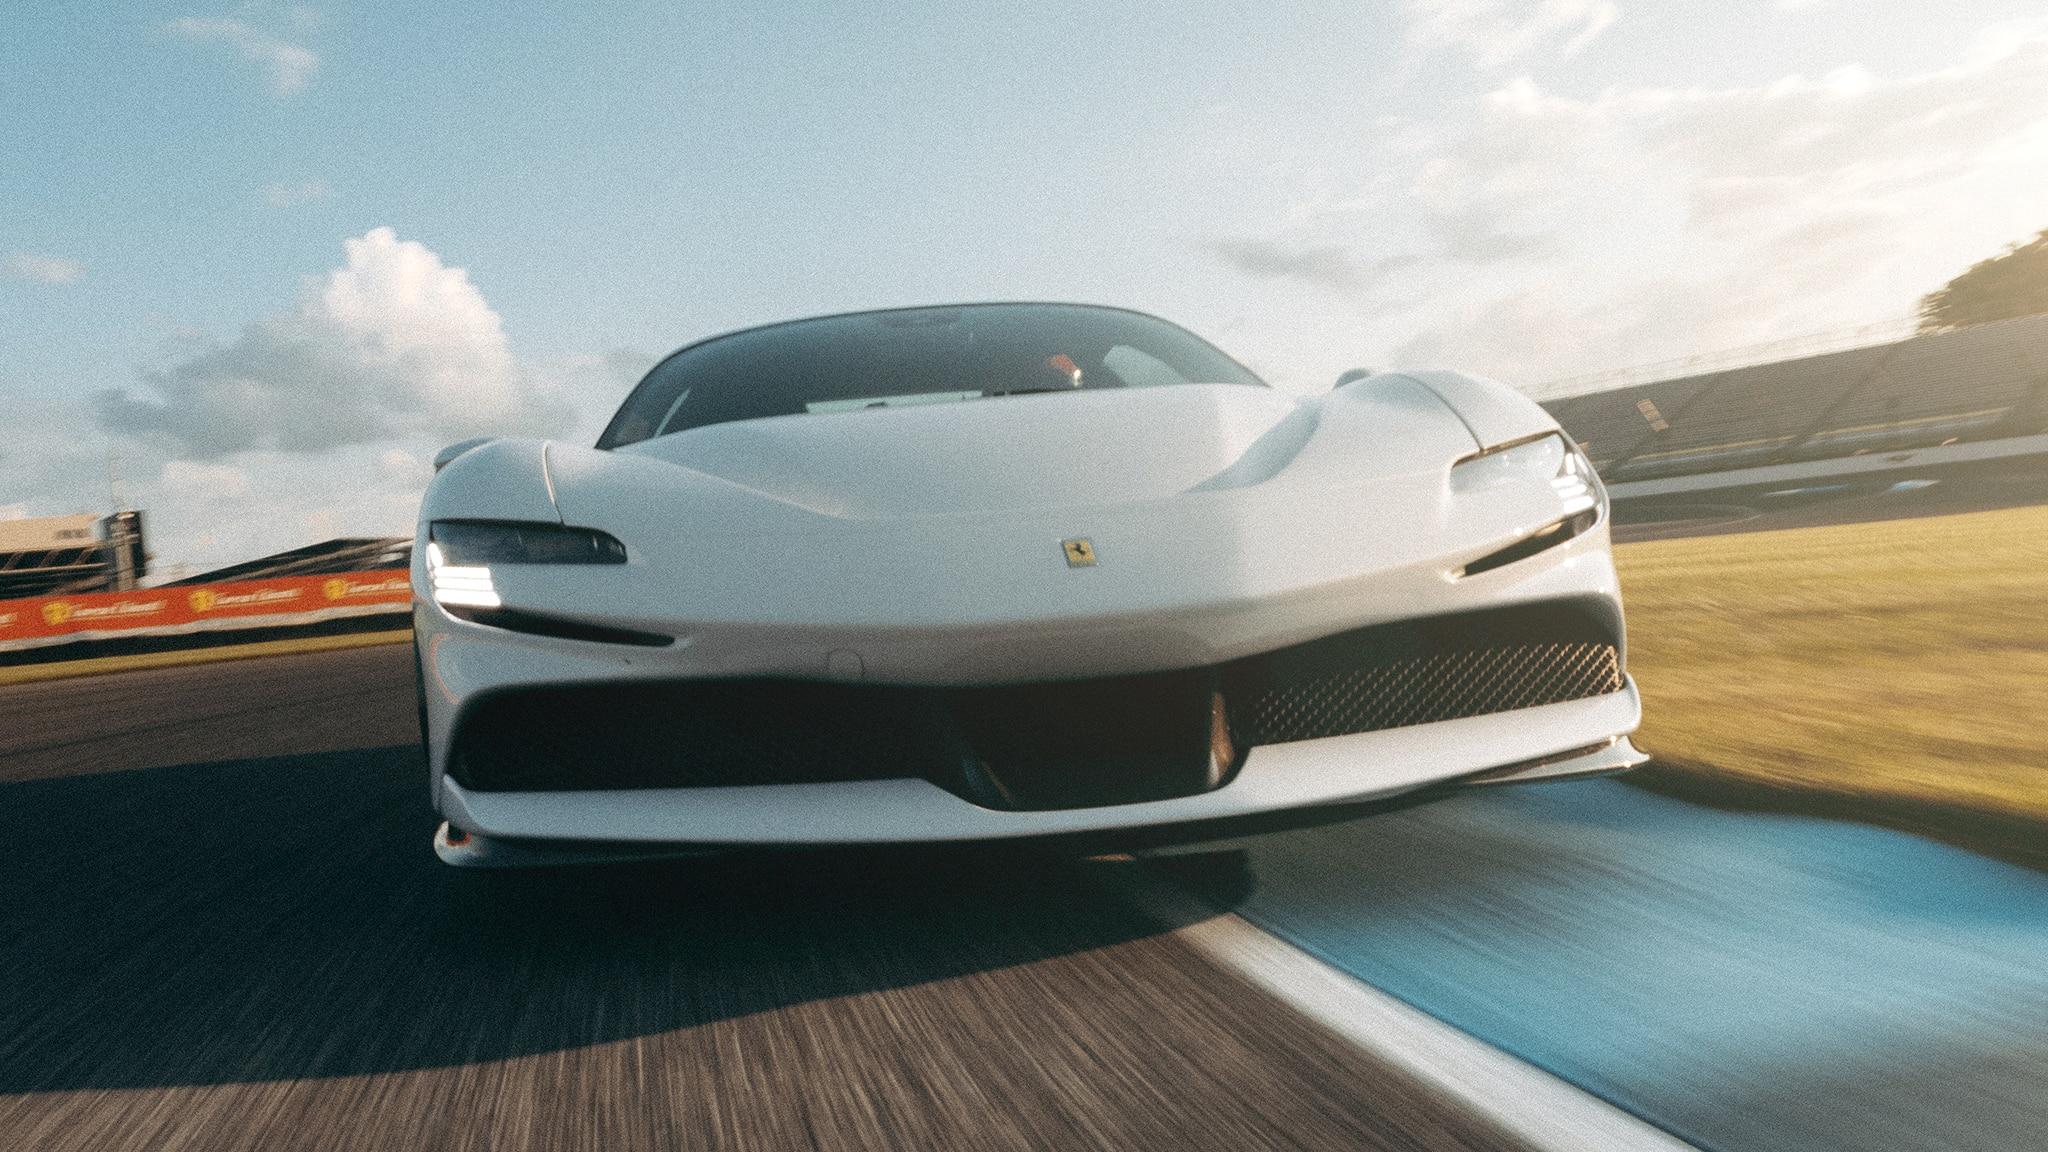 Ferrari SF90 Stradale прошёл трек Indianapolis Motor Speedway длиной 2,438 мили (3,925 км) в Индиане (США) за 1 мин. 29,625 с, достигнув 280,9 км/ч.